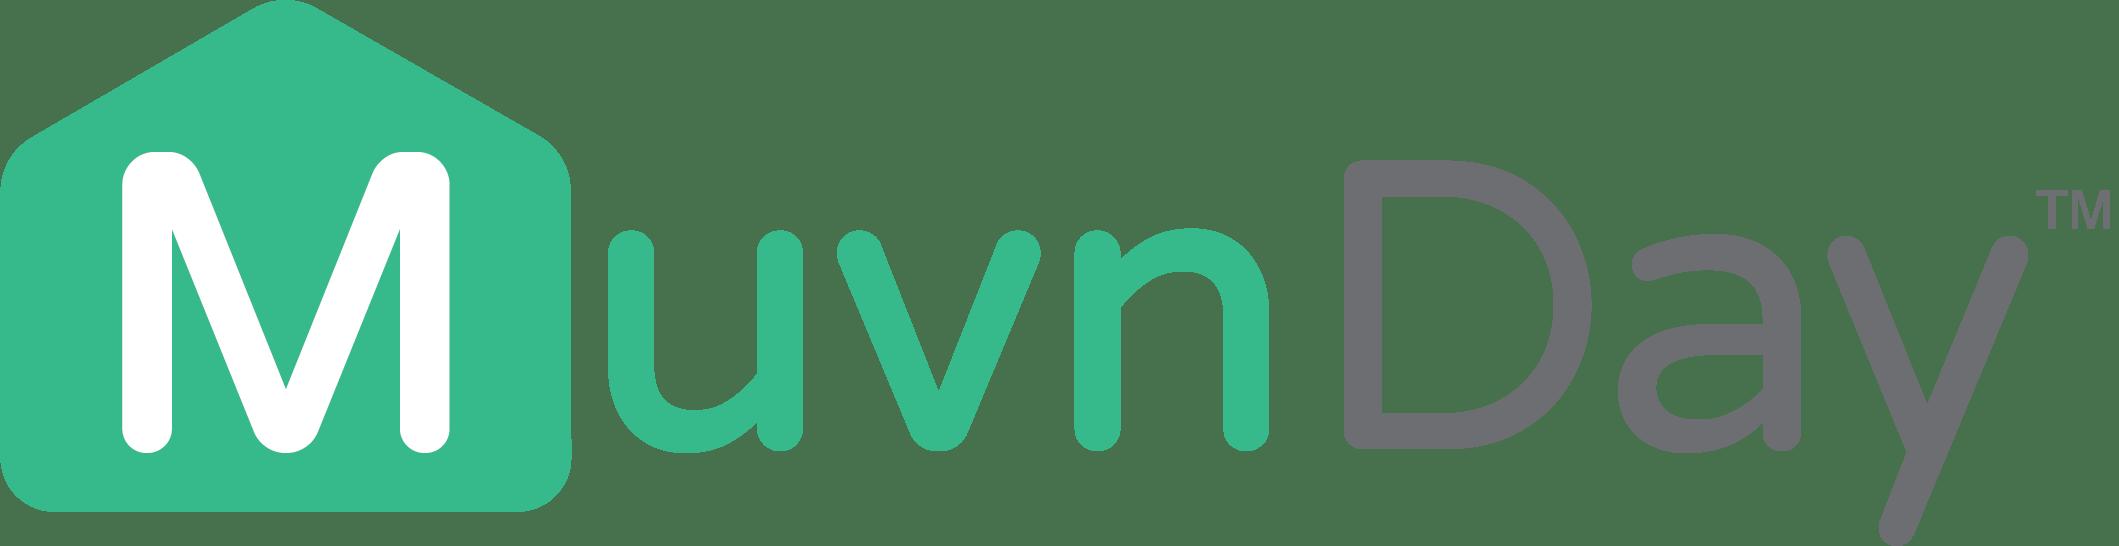 muvnday_logo_color_tm.png